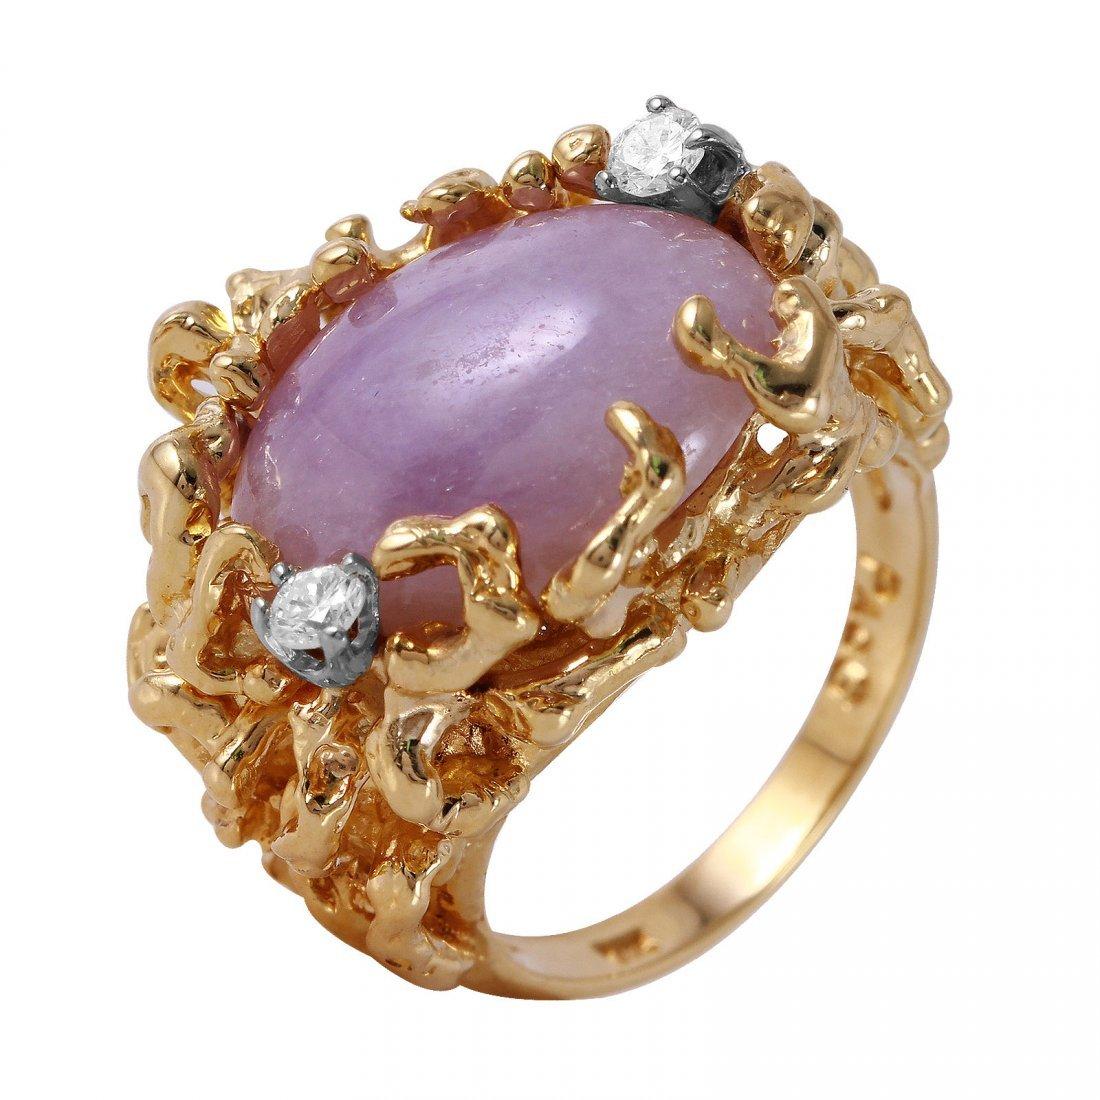 14KT Yellow Gold Jade and Diamond Ring - #63